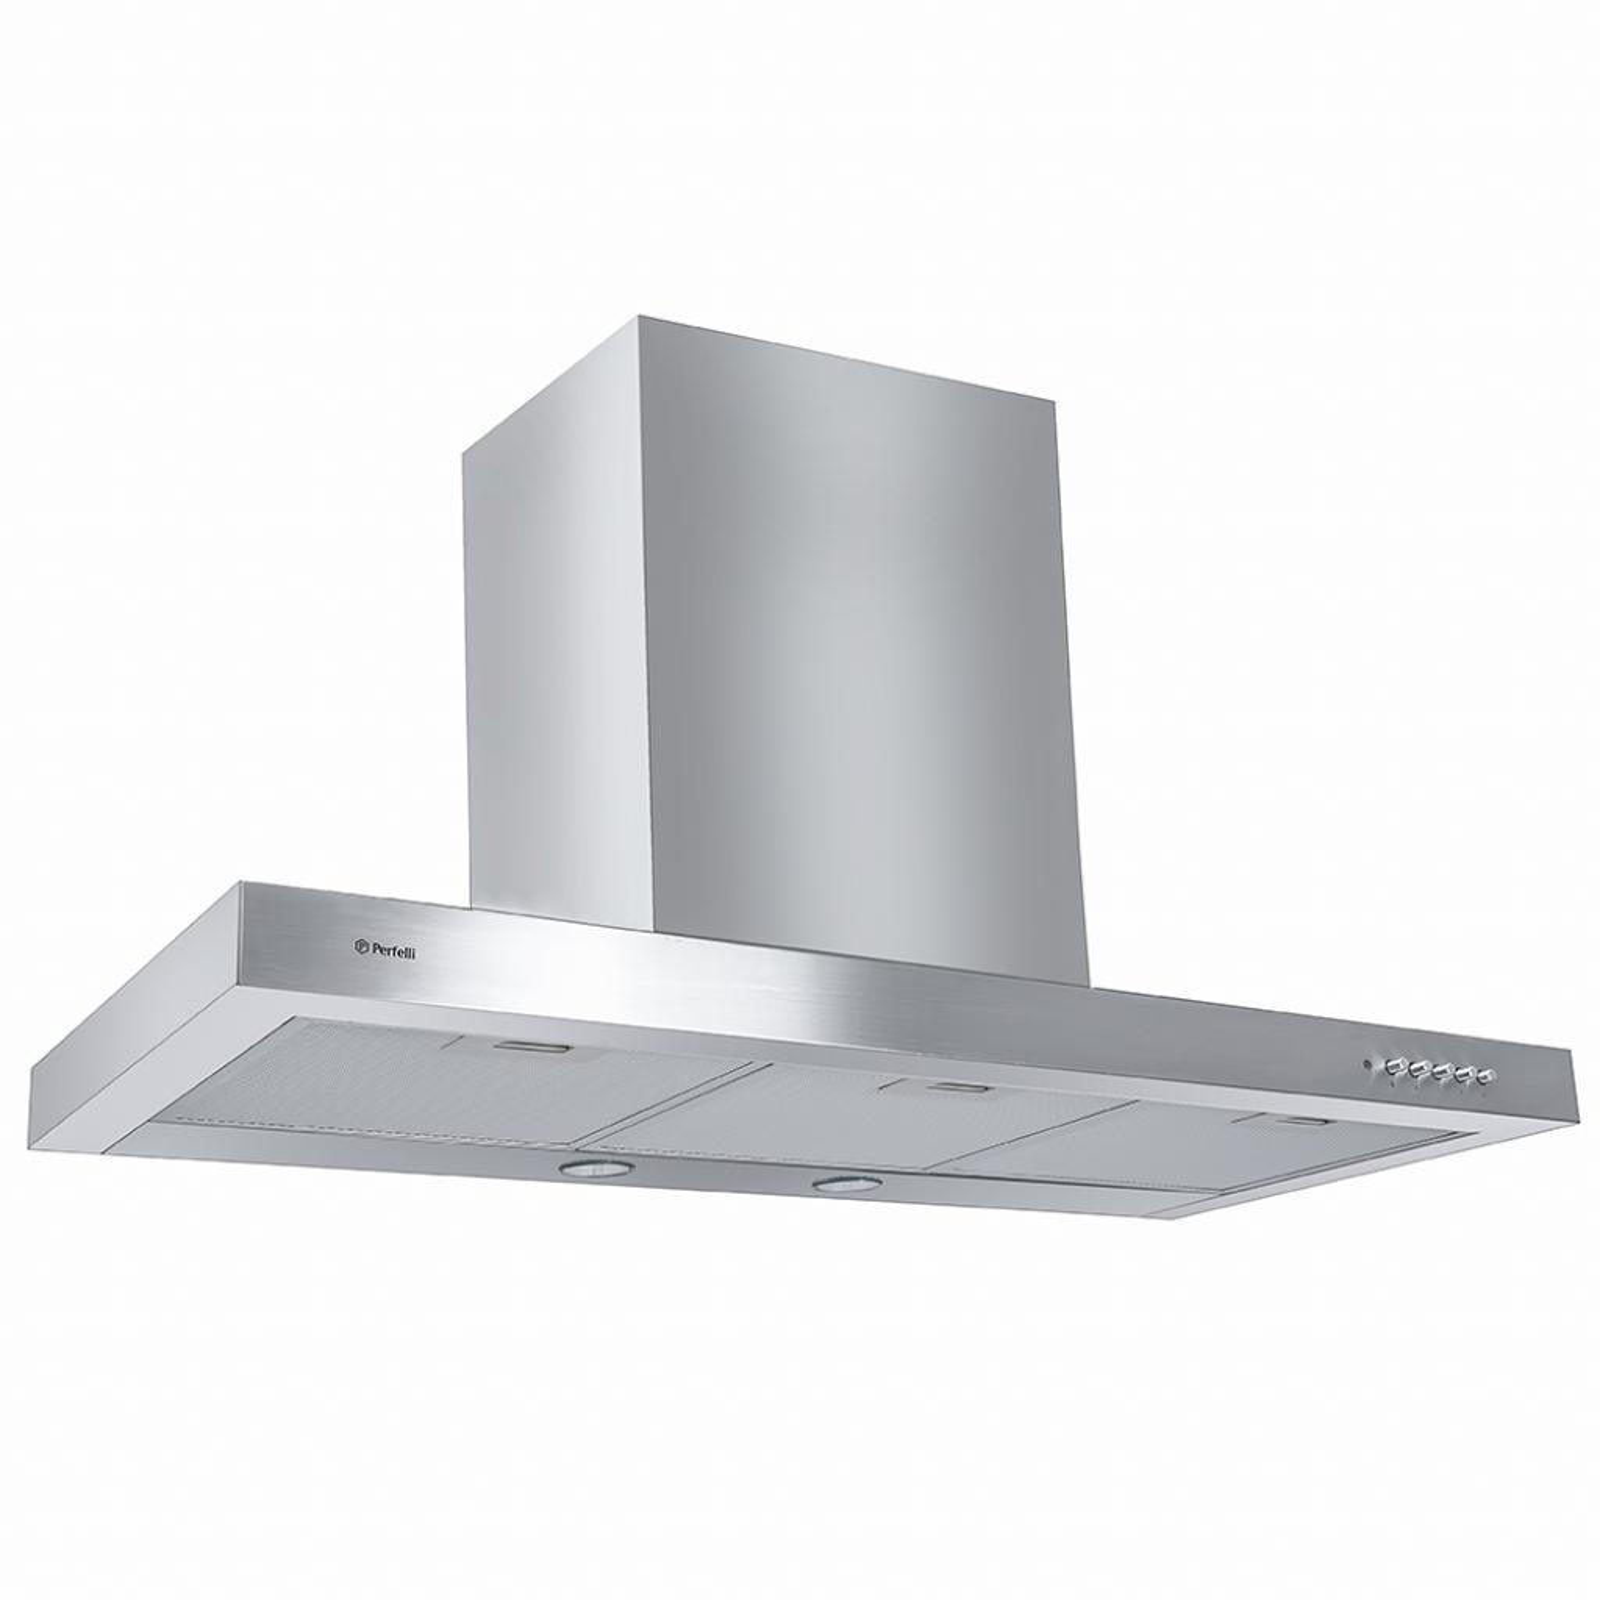 Вытяжка кухонная PERFELLI T 9101 I